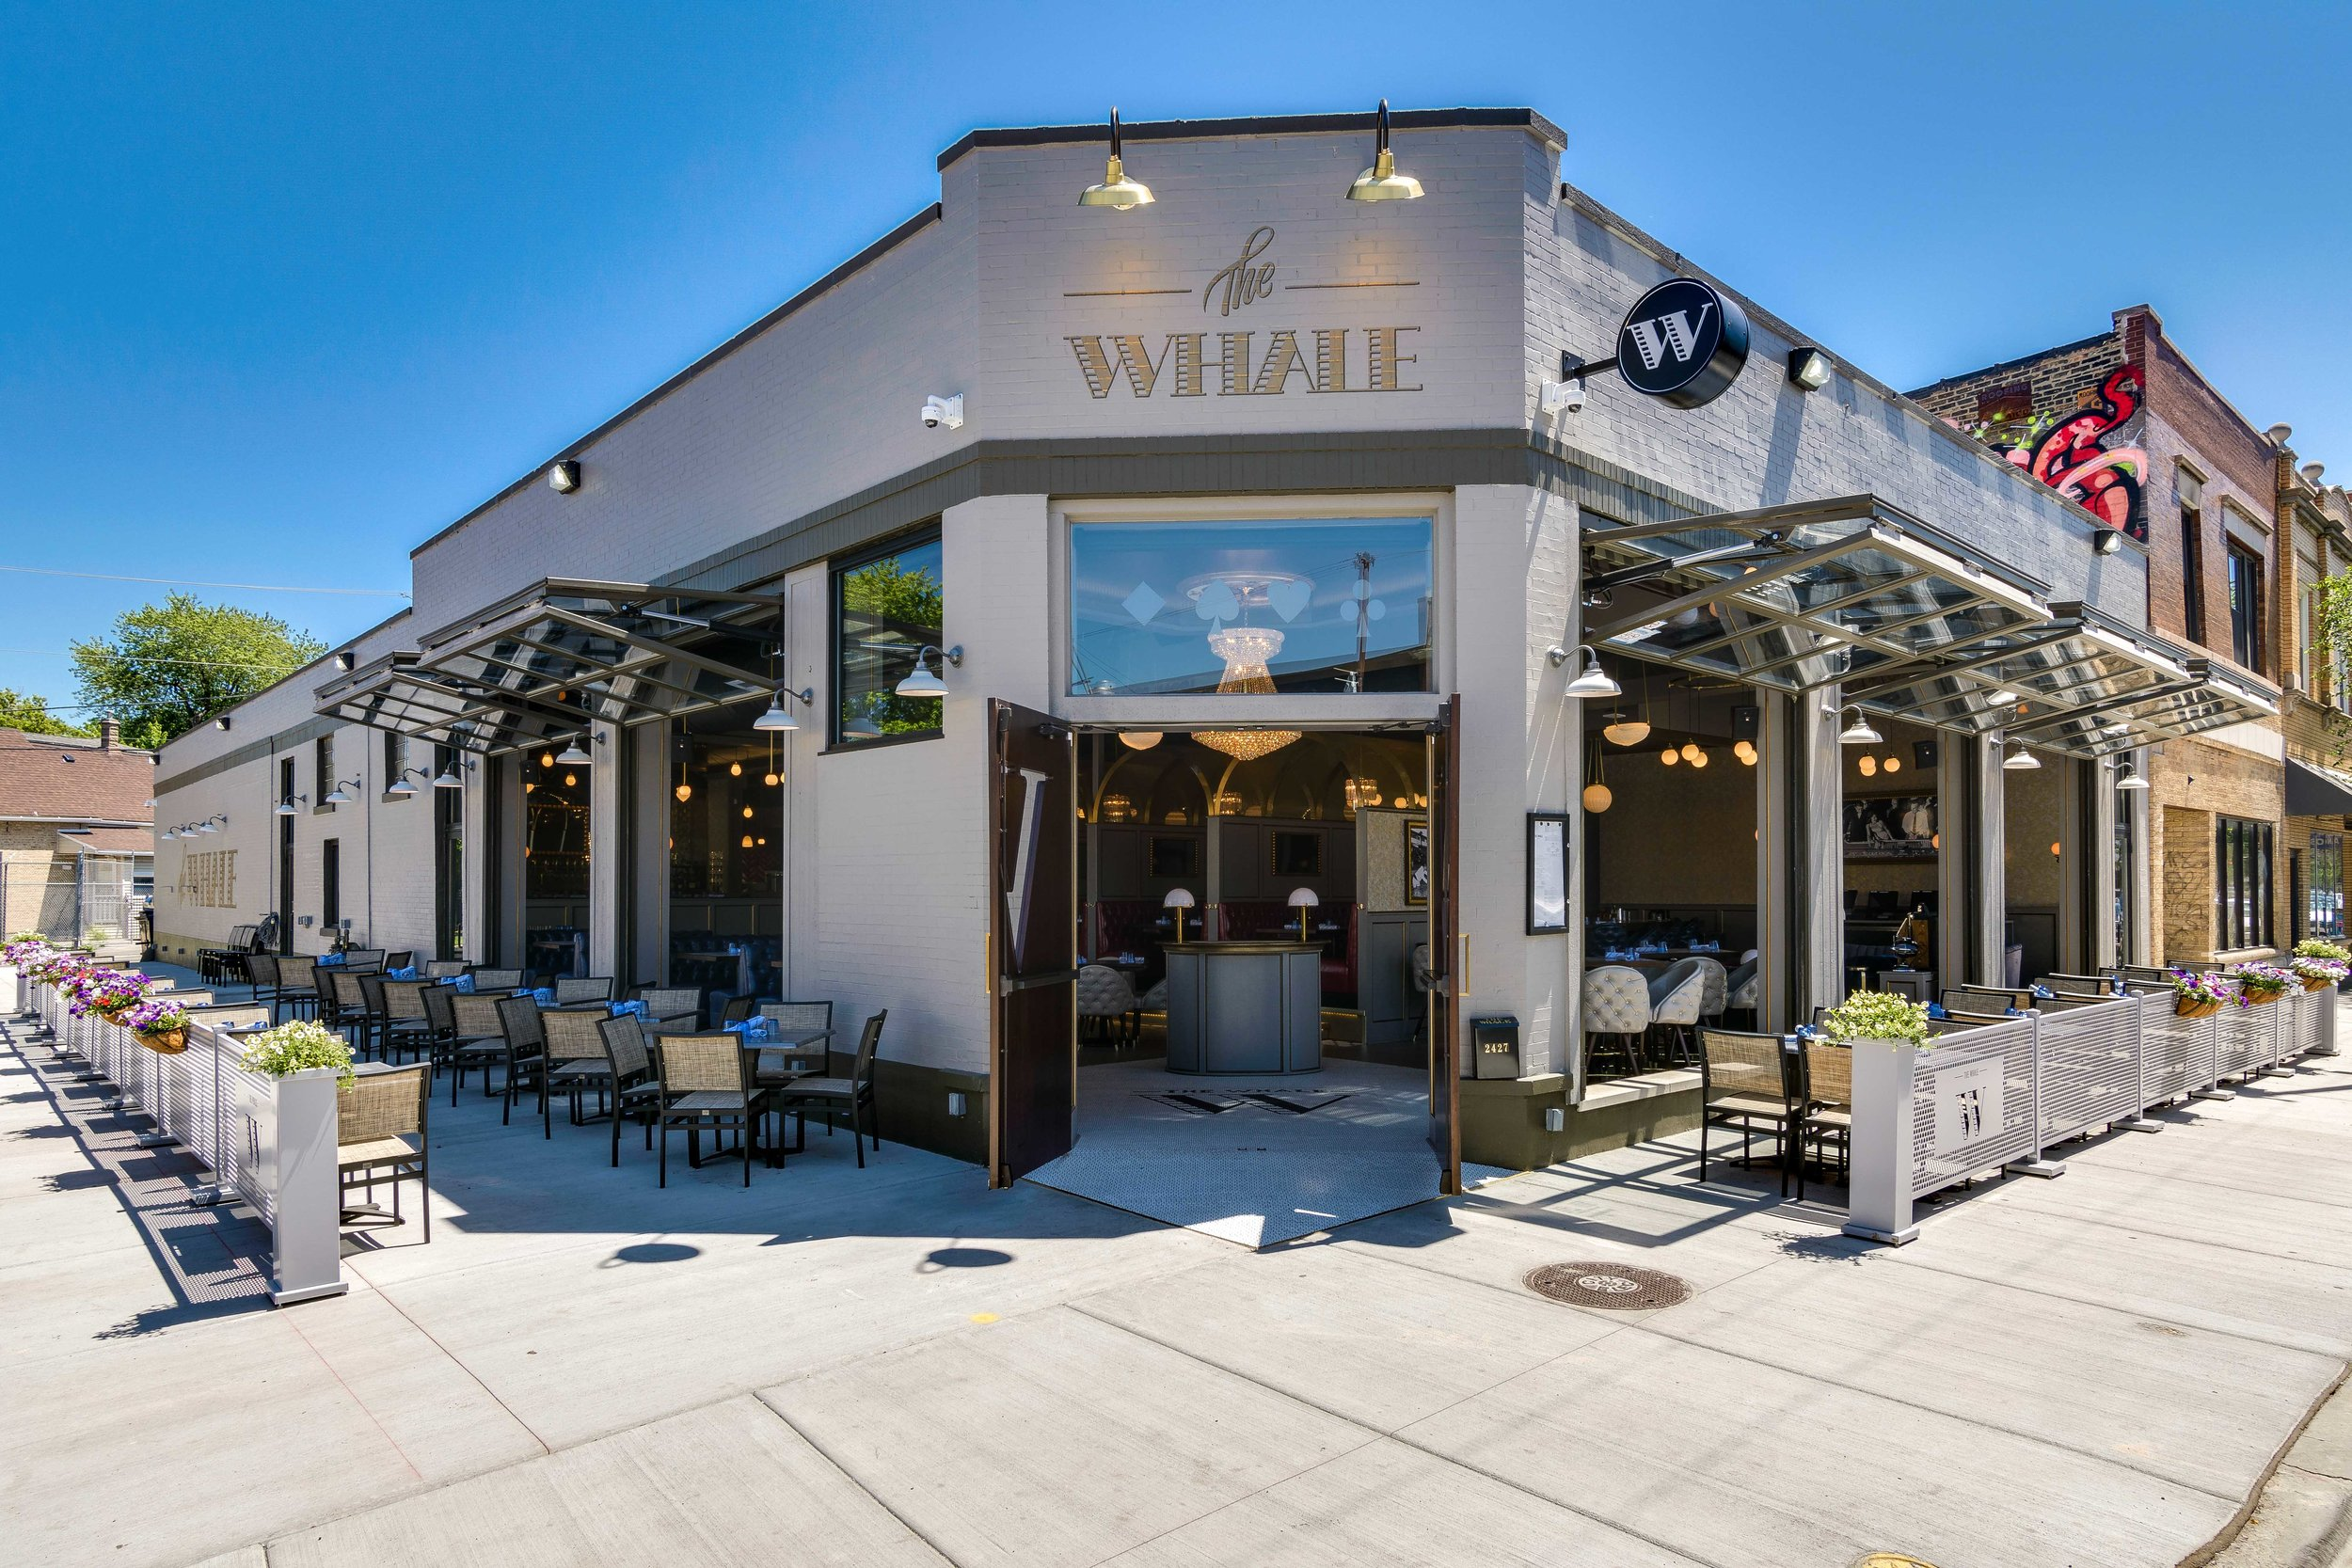 The Whale Restaurant - Web_057.jpg